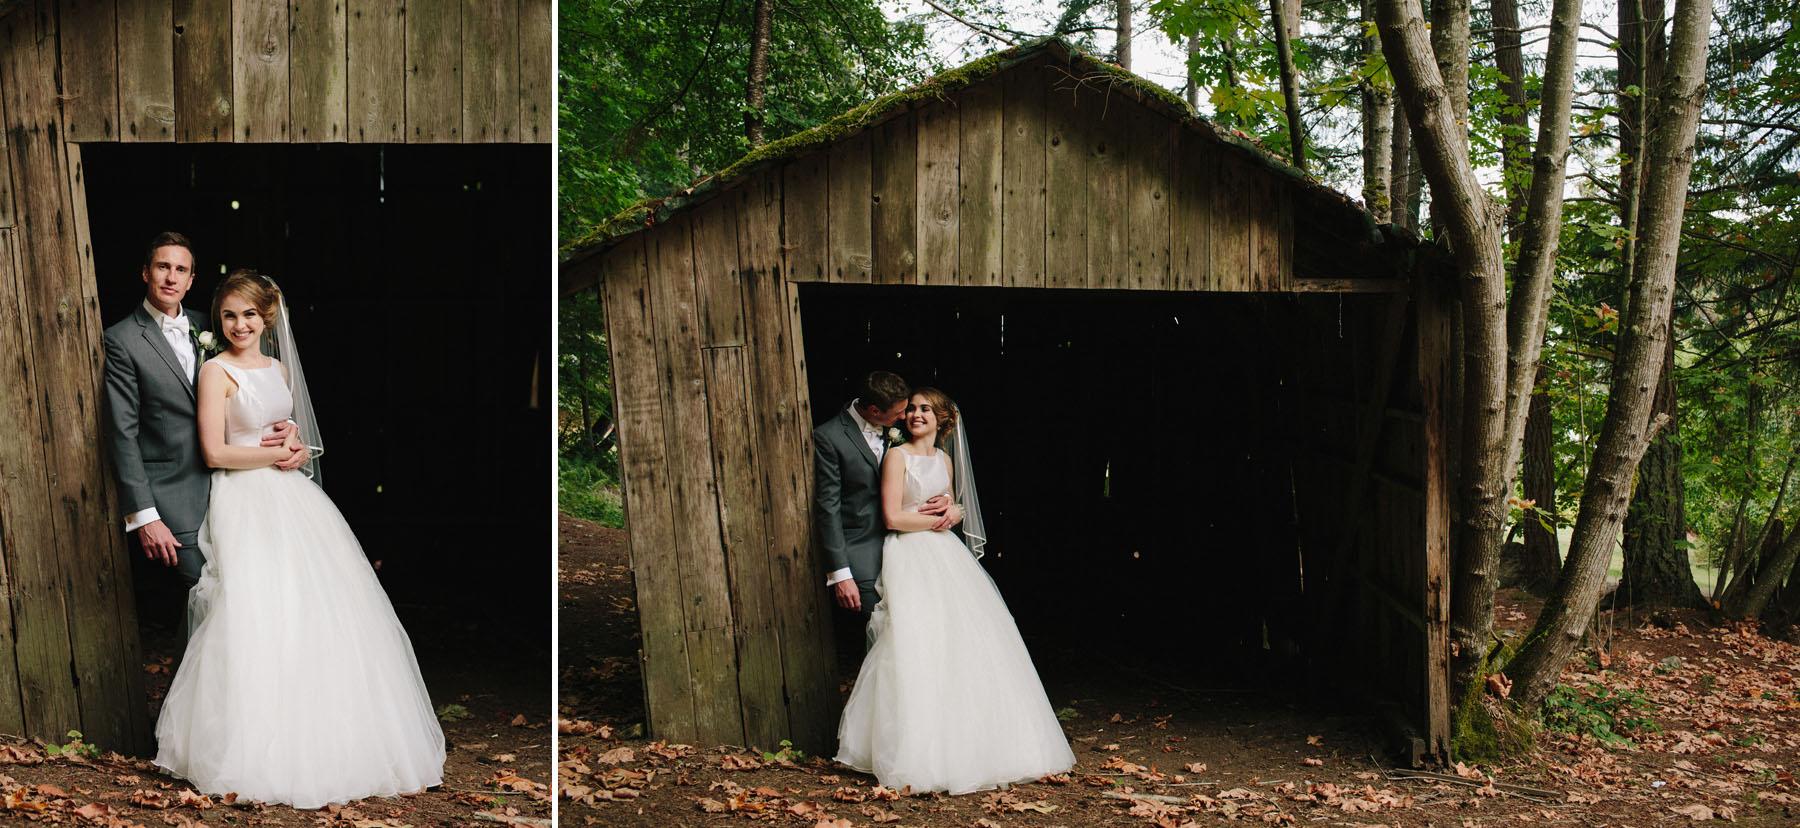 thetis-island-wedding-photographer-rp-rn-110.jpg